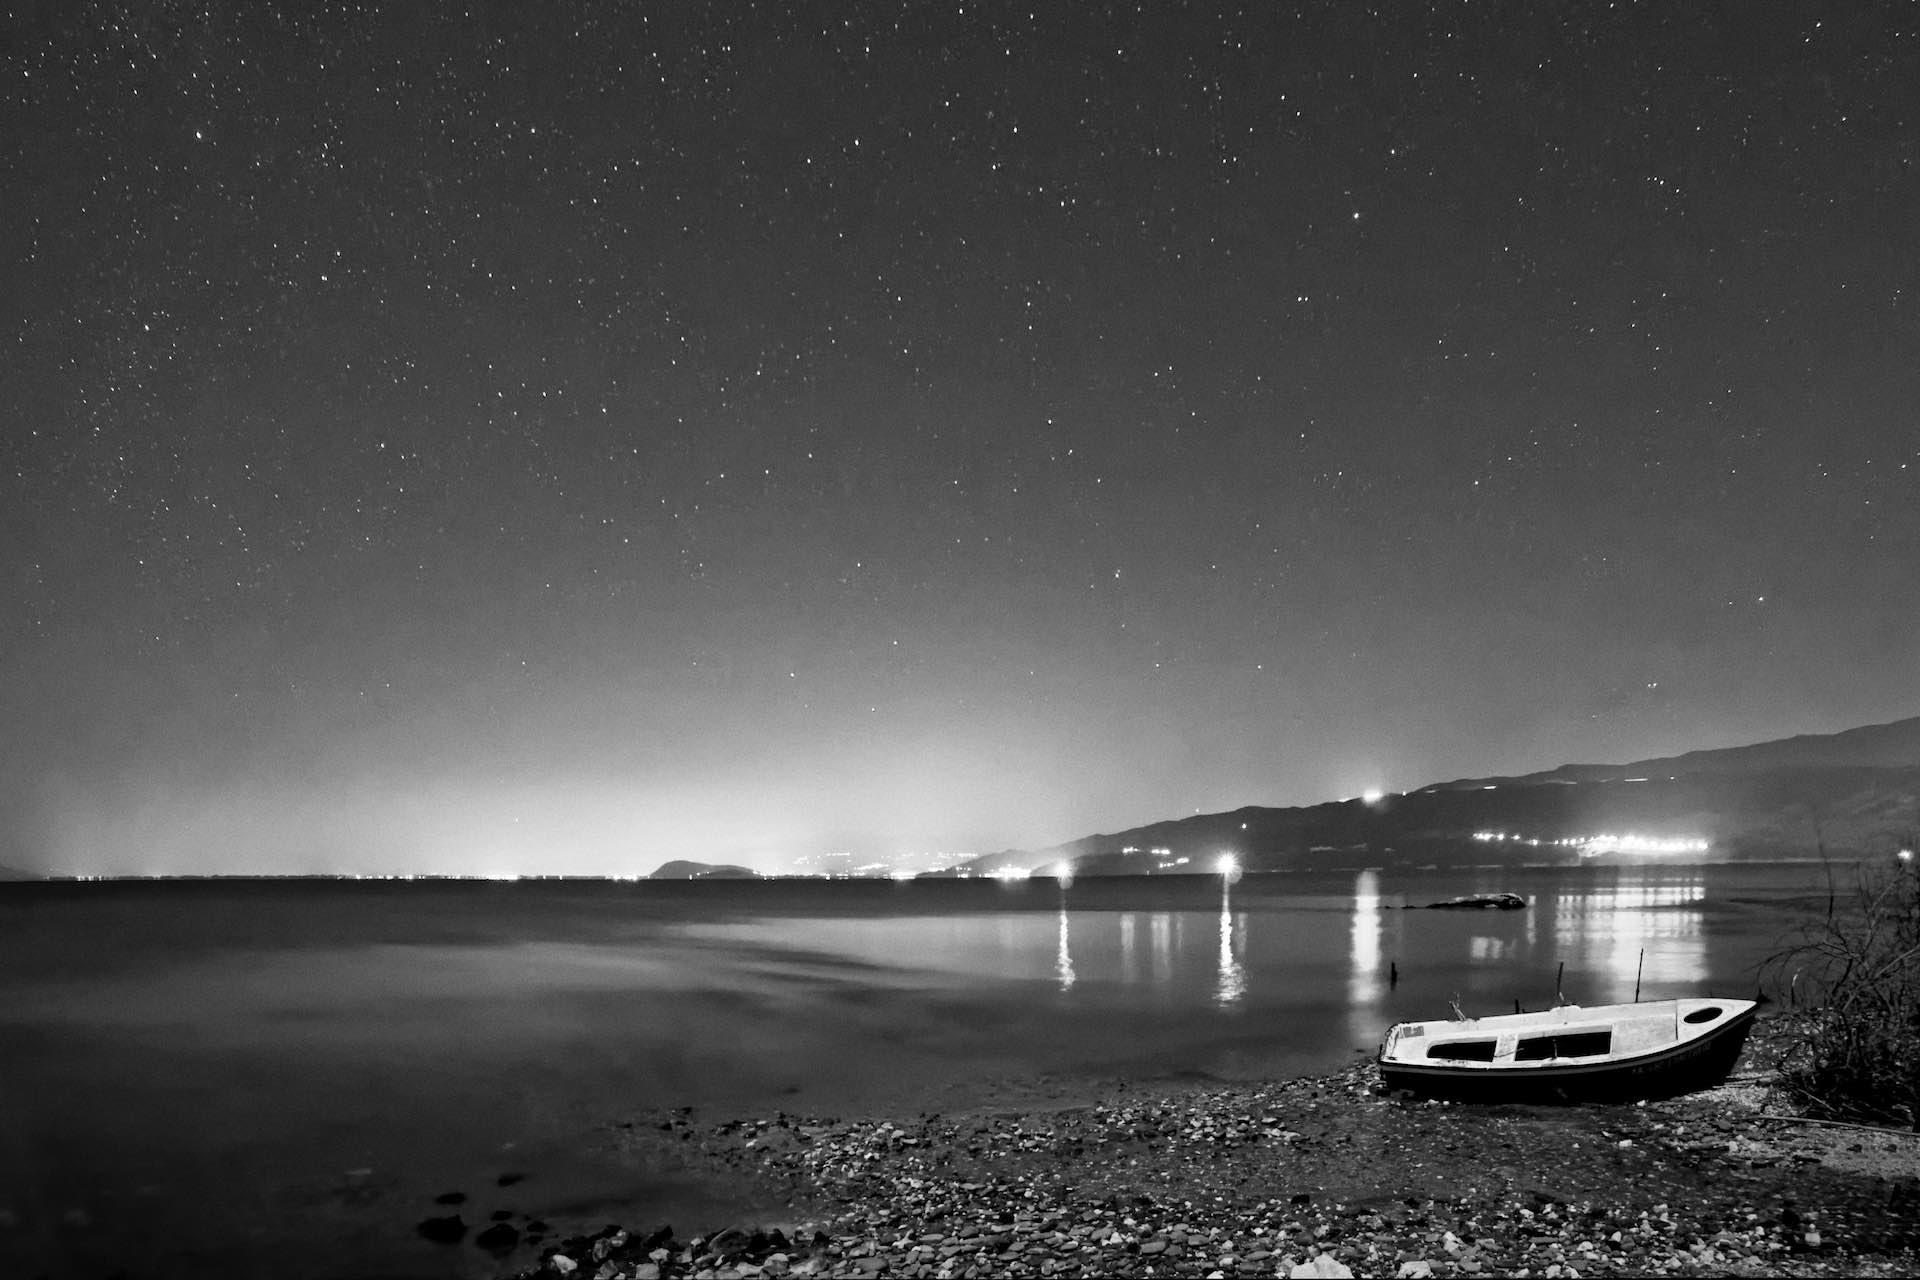 Nocturnal Seascape